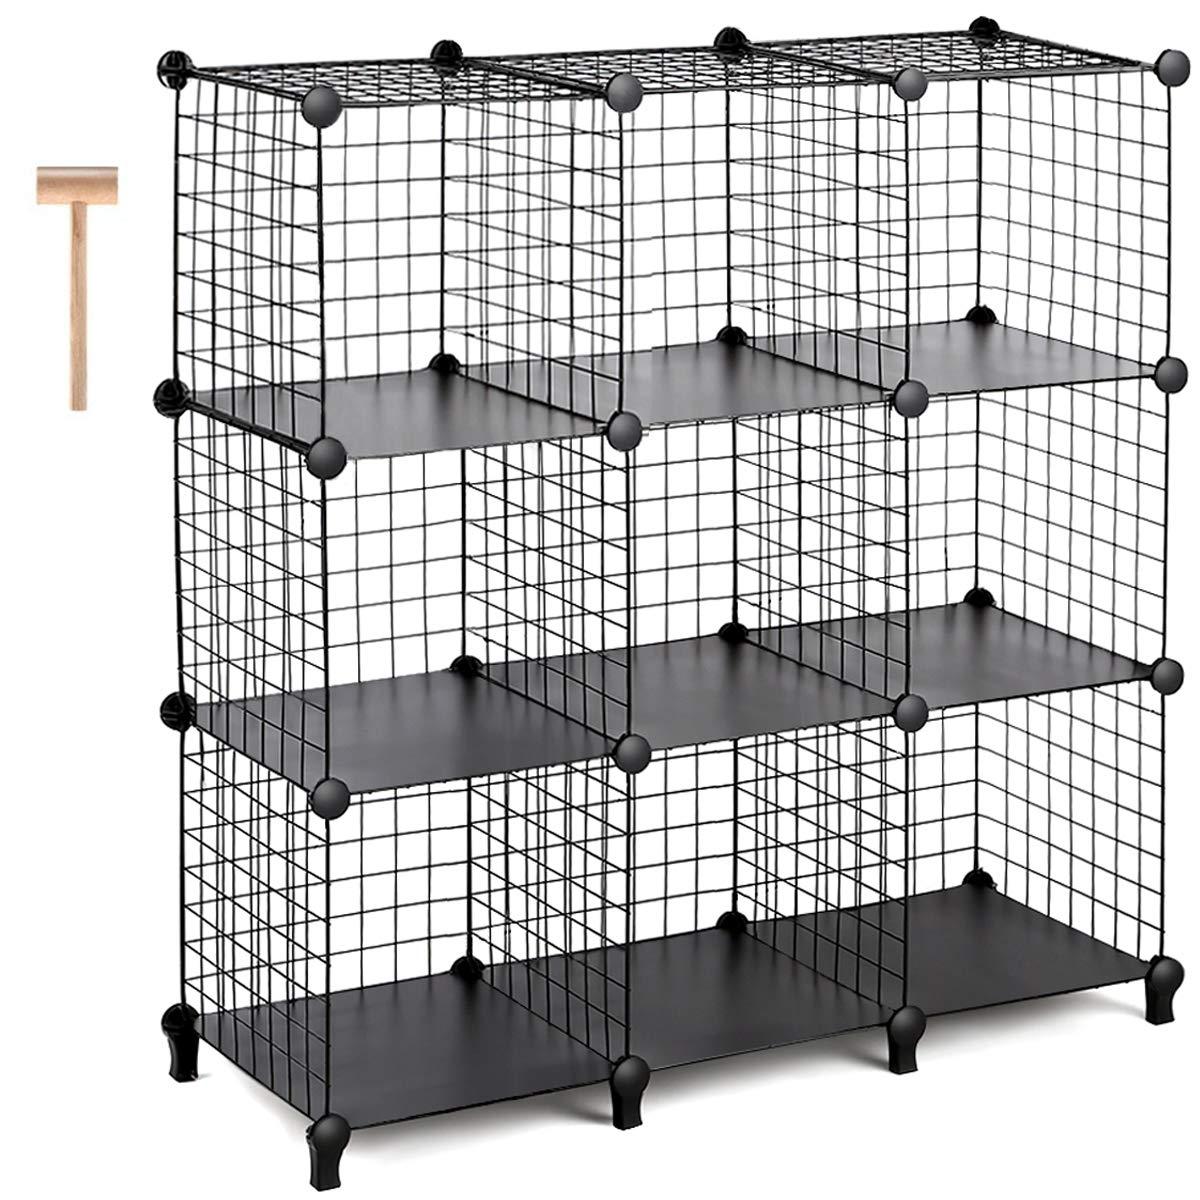 TomCare Cube Storage 9-Cube Metal Wire Cube Storage Storage Cubes Shelves Cube Closet Organizer Stackable Storage Bins DIY Storage Grids Modular Wire Cubes Bookshelf Bookcase for Home Office, Black